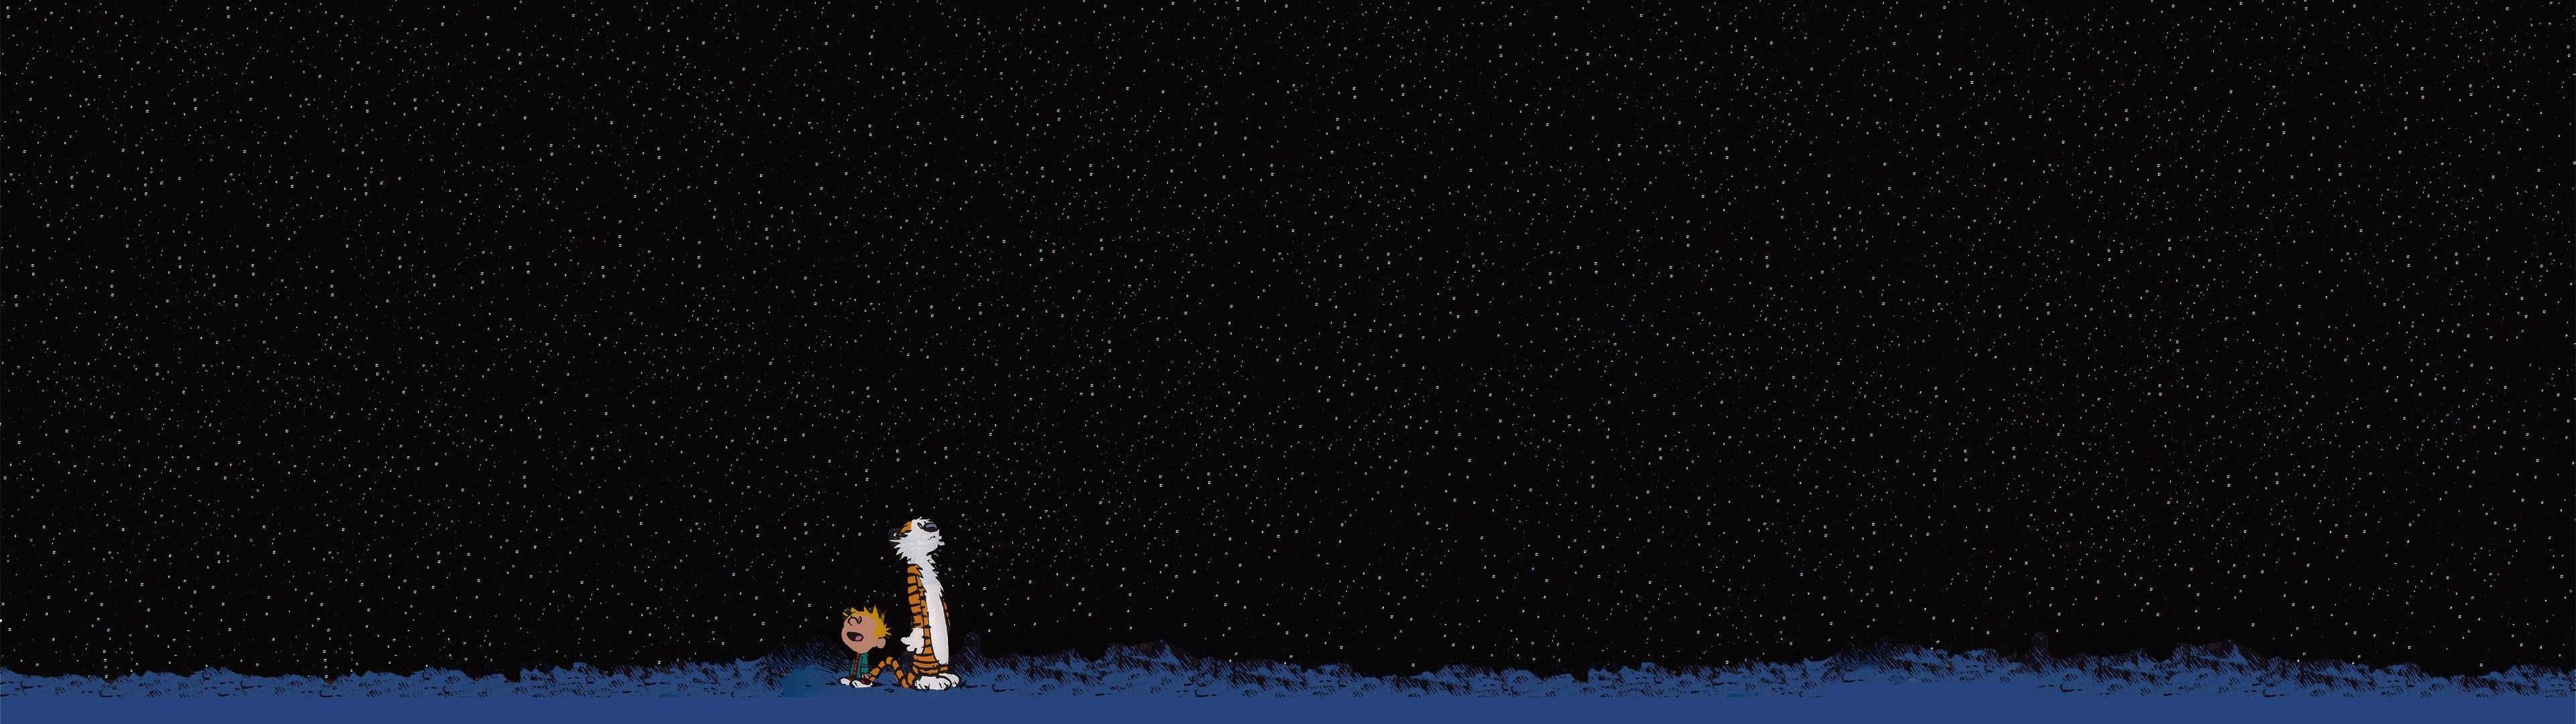 Free Download Stars Calvin And Hobbes Desktop 3840x1080 Hd